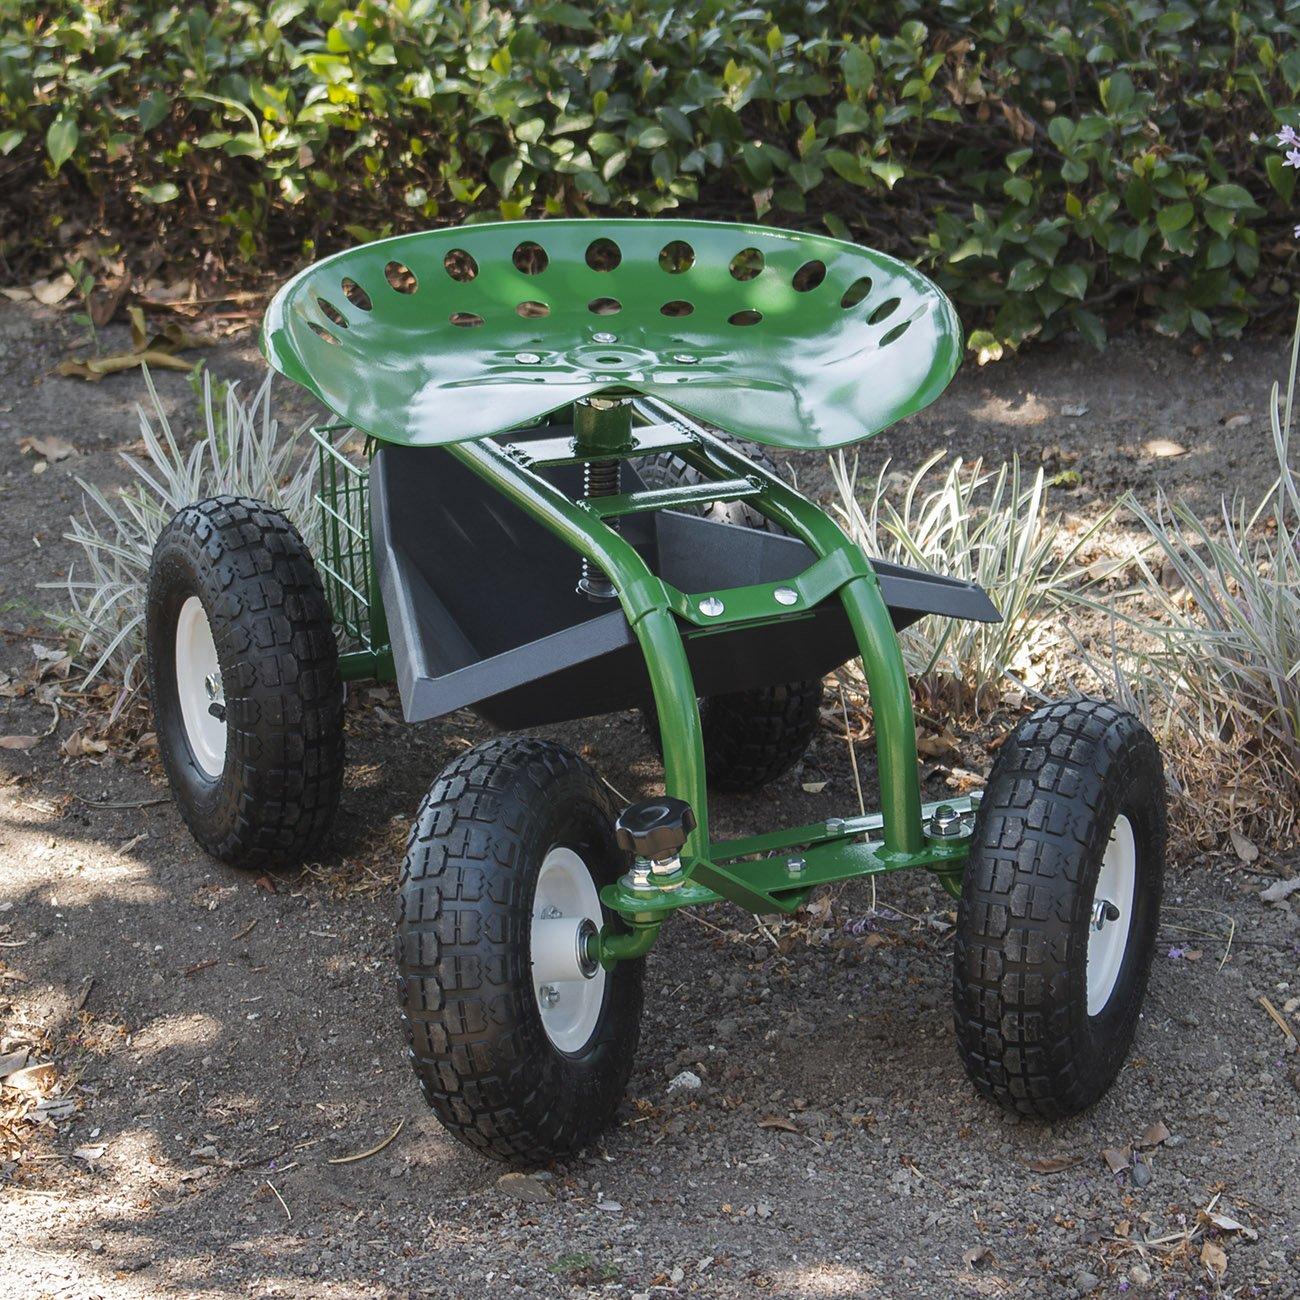 ARKSEN Rolling Garden Cart Backyard Adjustable Seat Swivel, Basket w/ Steering Handle Green